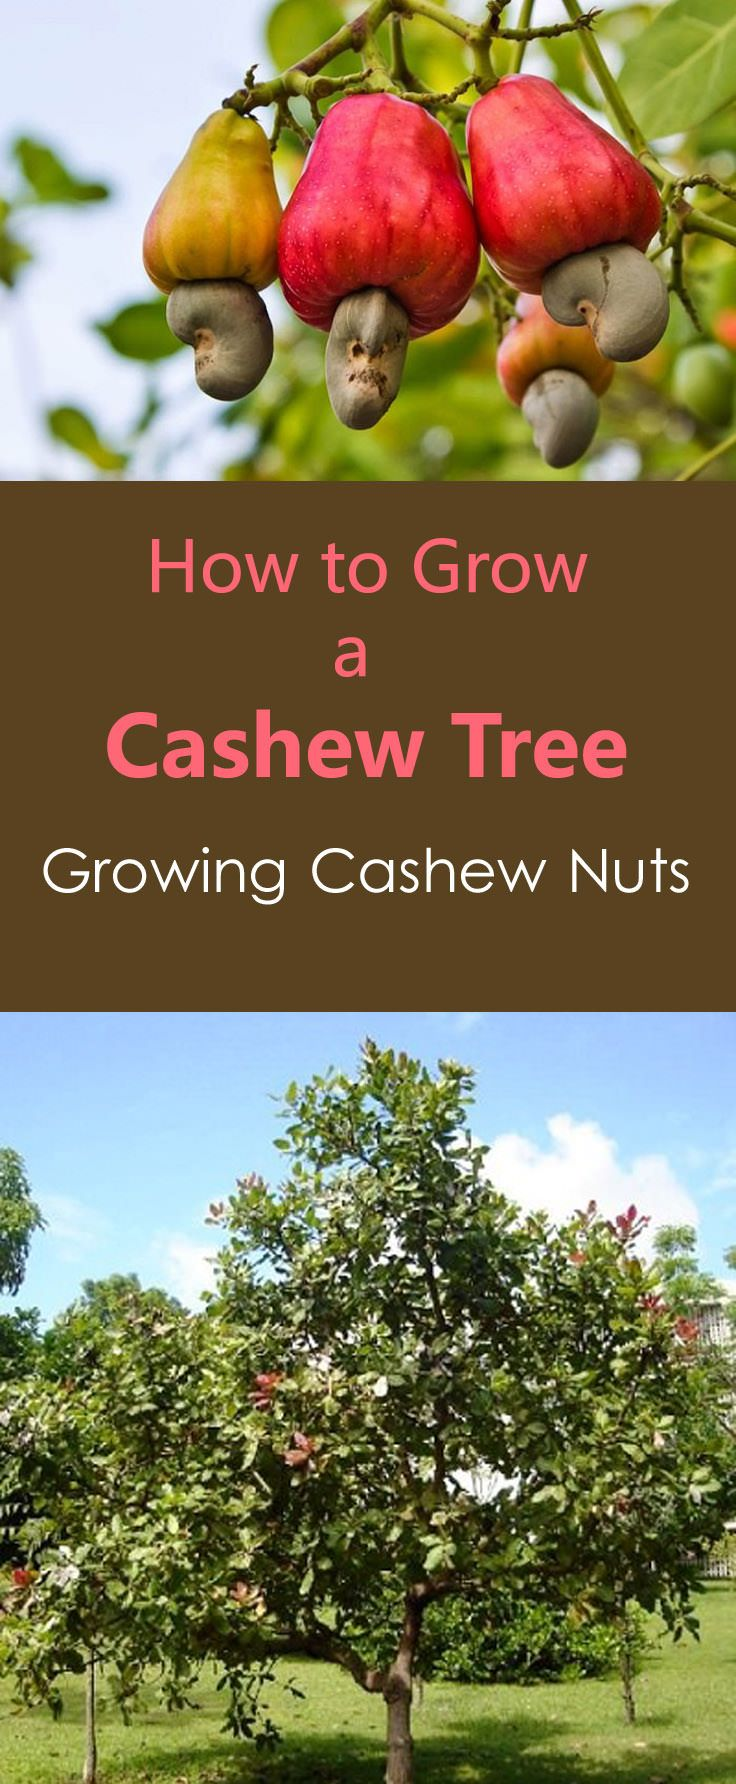 How to Grow a Cashew Nut Tree Cashew tree, Gardens and